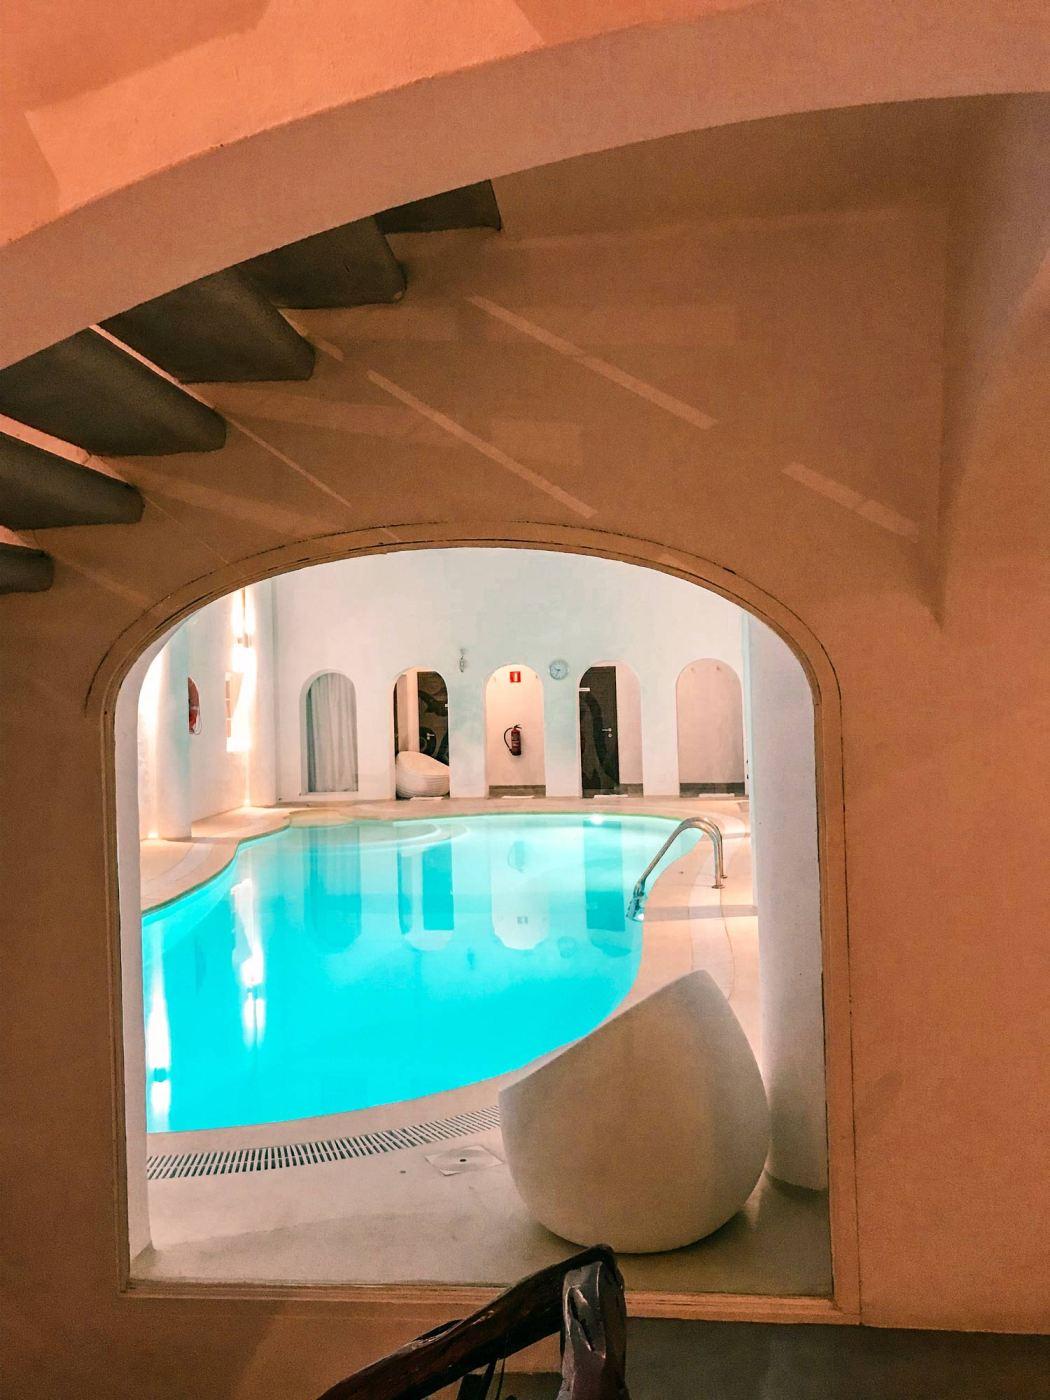 Just one of the many pools at Hacienda Na Xamena